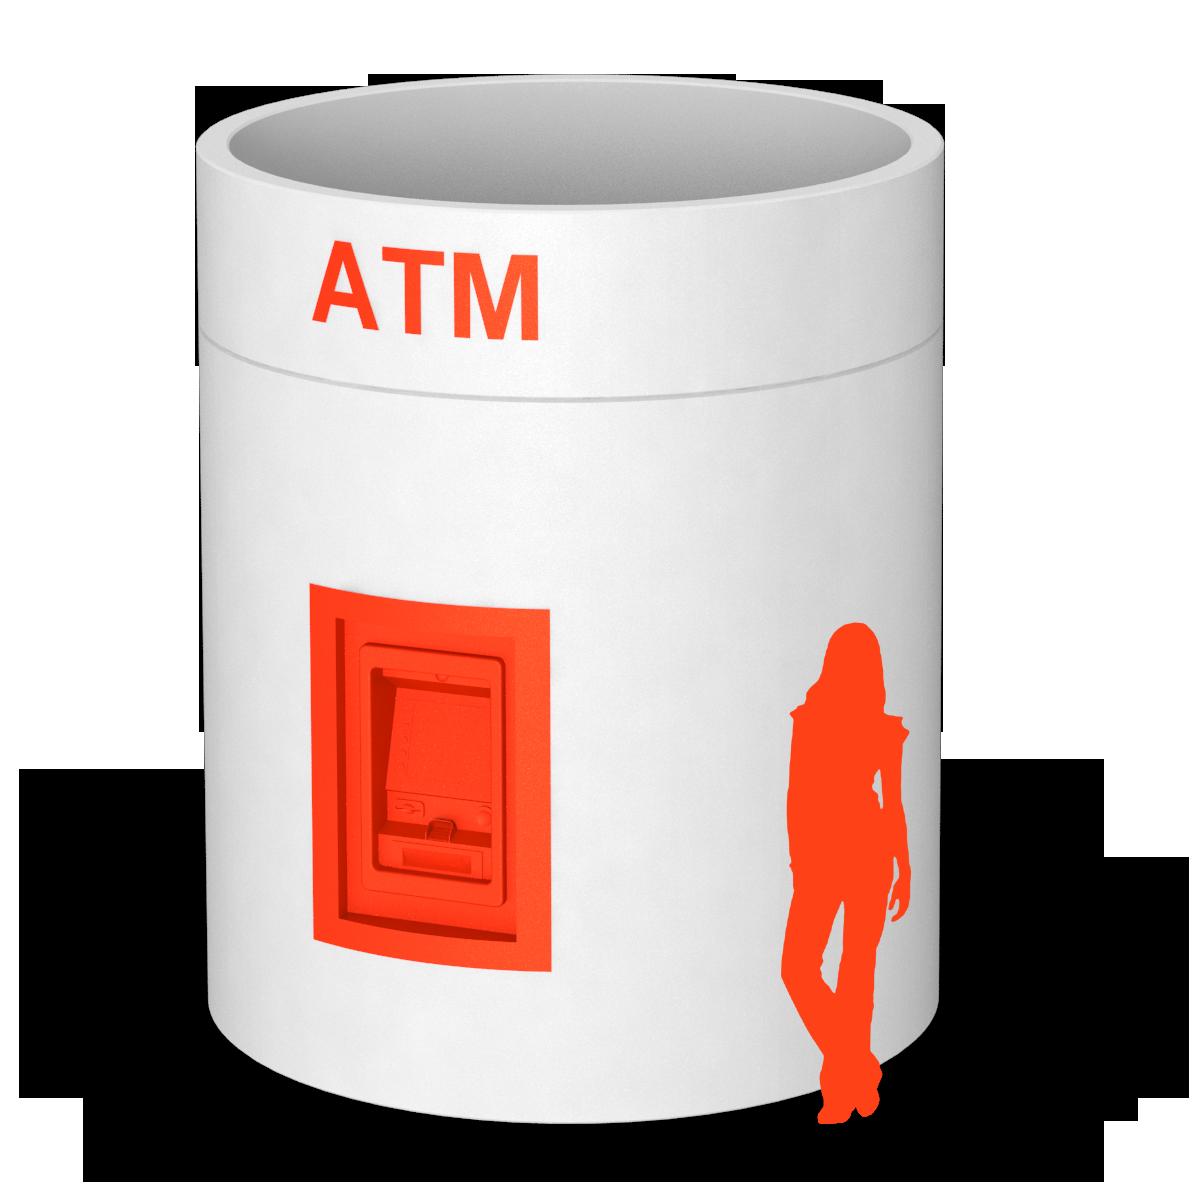 bboxx ATM 1 external ATM